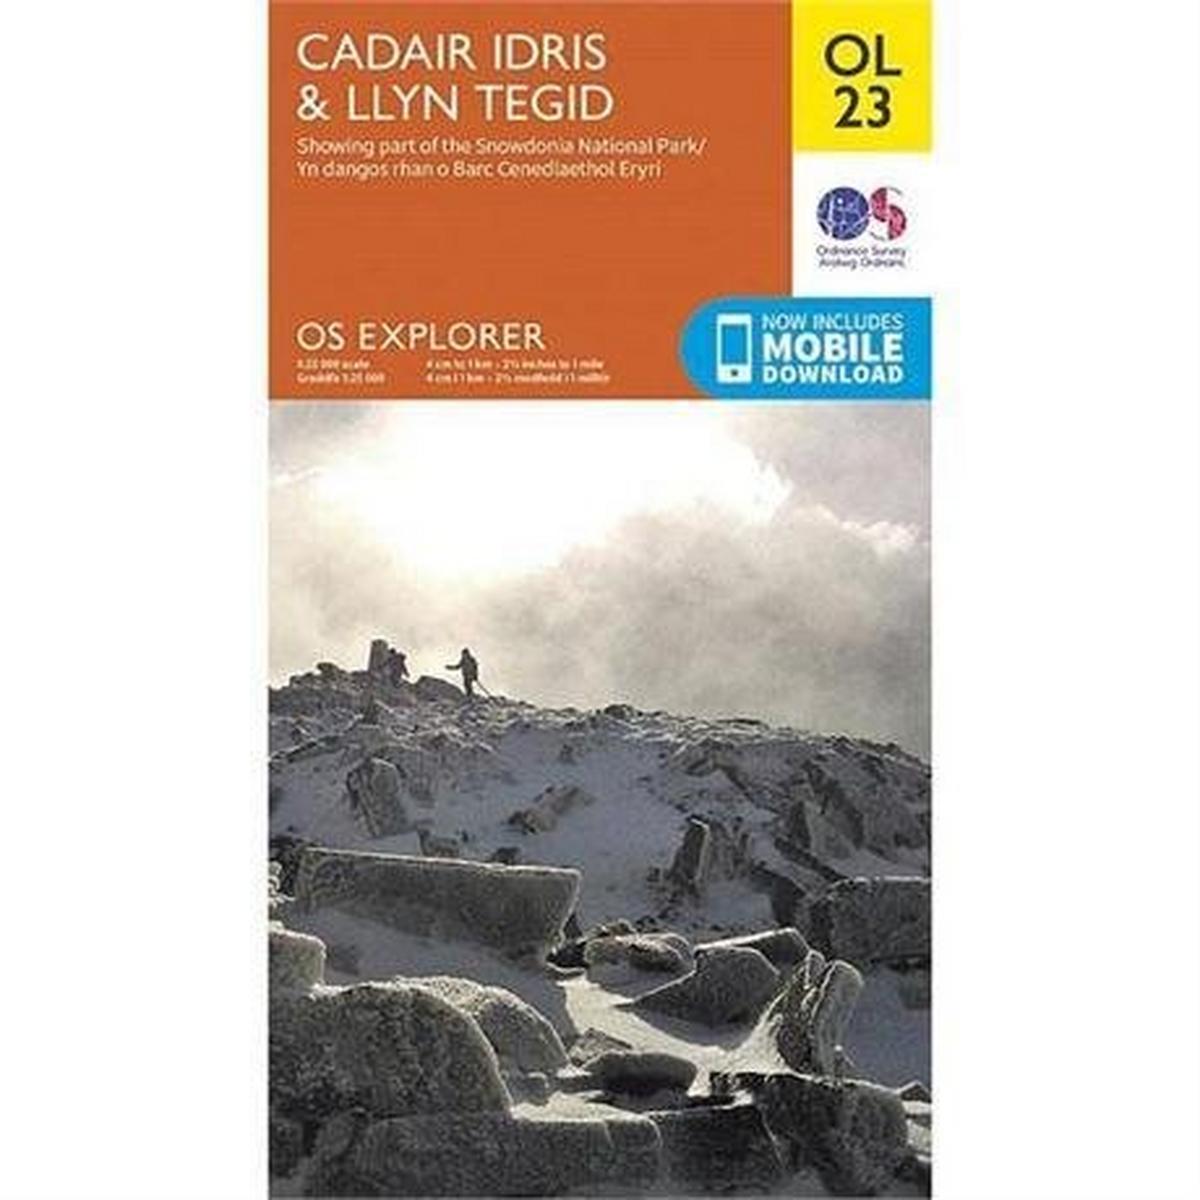 Ordnance Survey OS Explorer Map OL23 Cadair Idris & Llyn Tegid